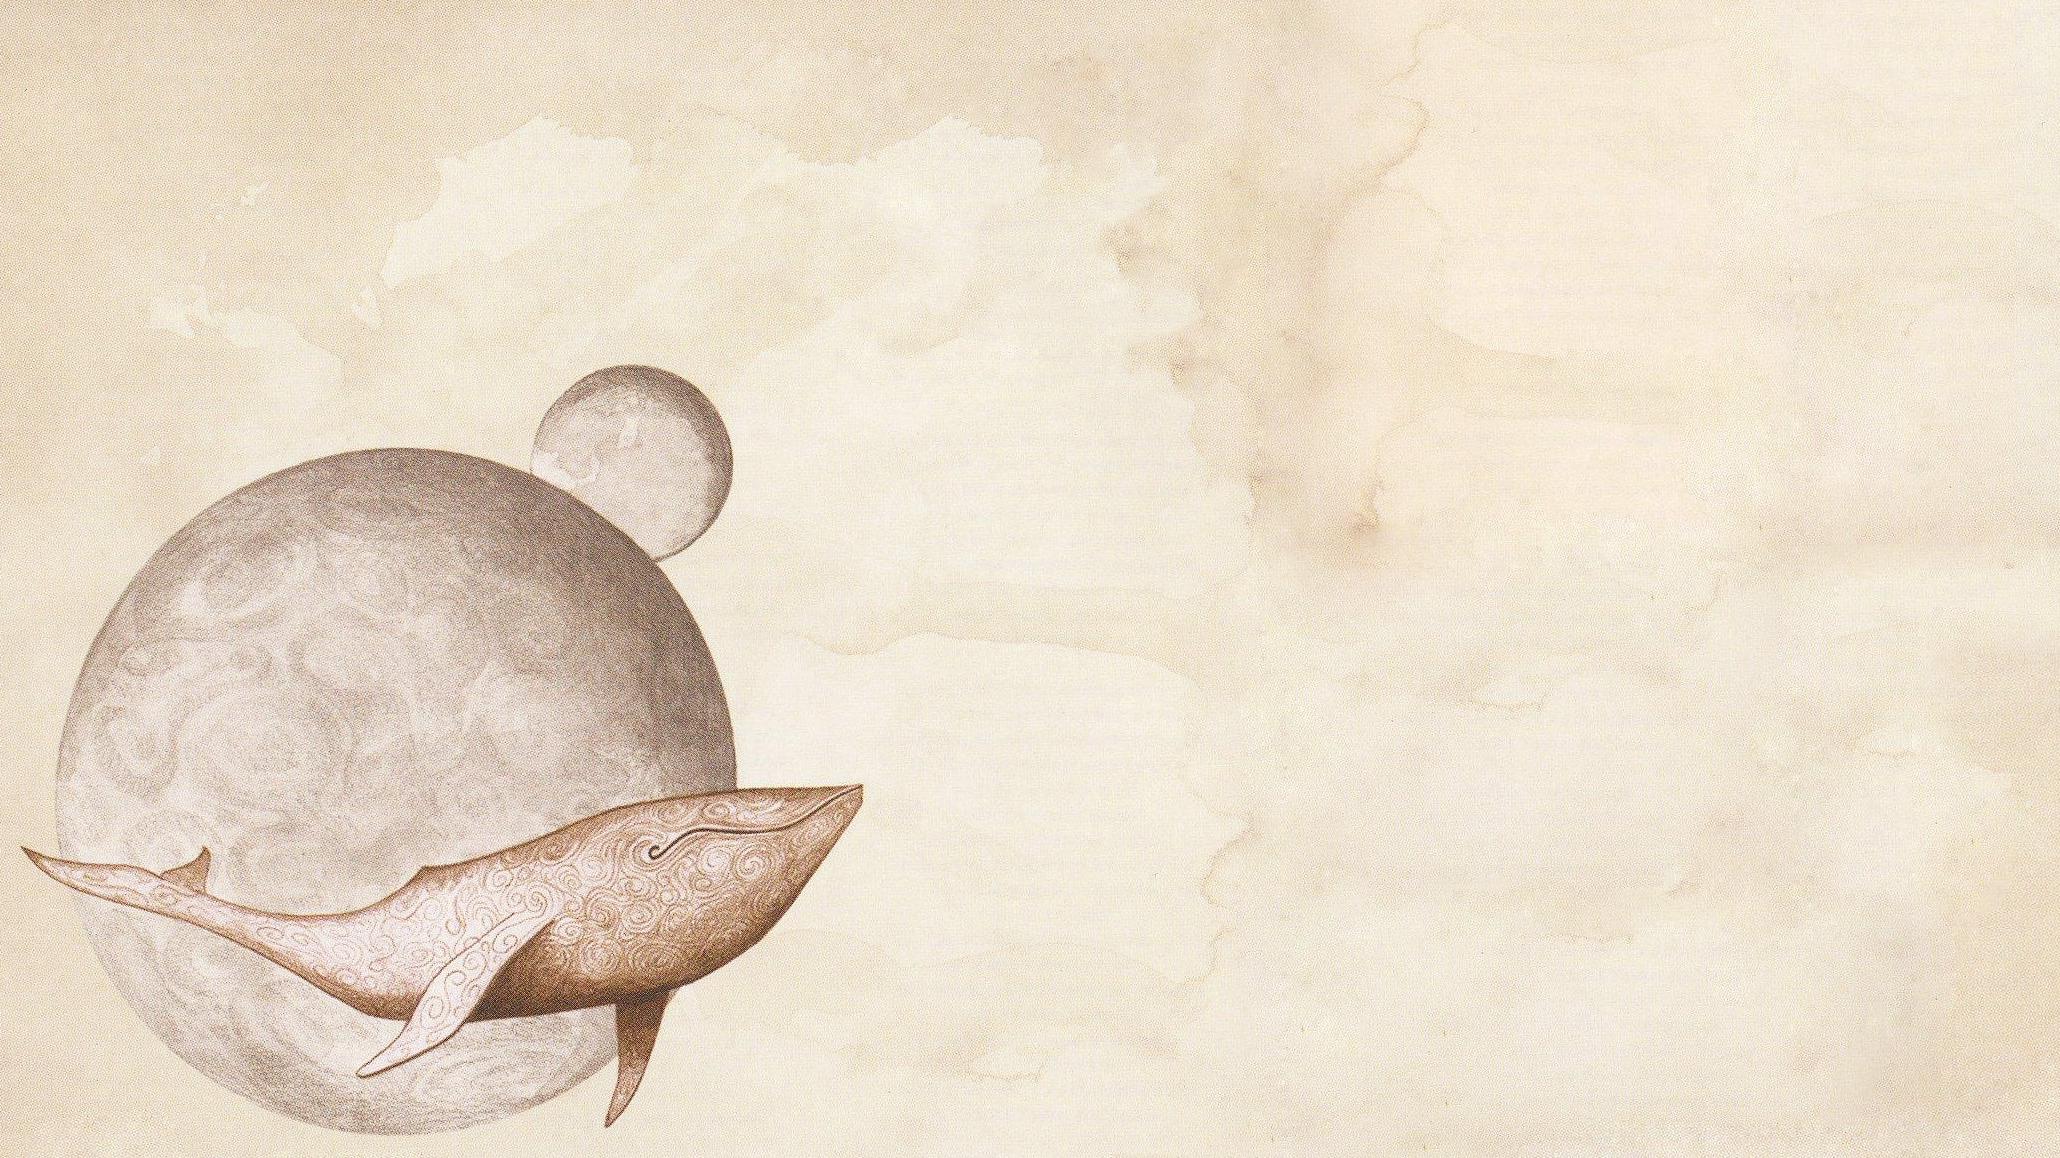 digital Art Universe Space Planet Minimalism Whale Simple 2060x1158